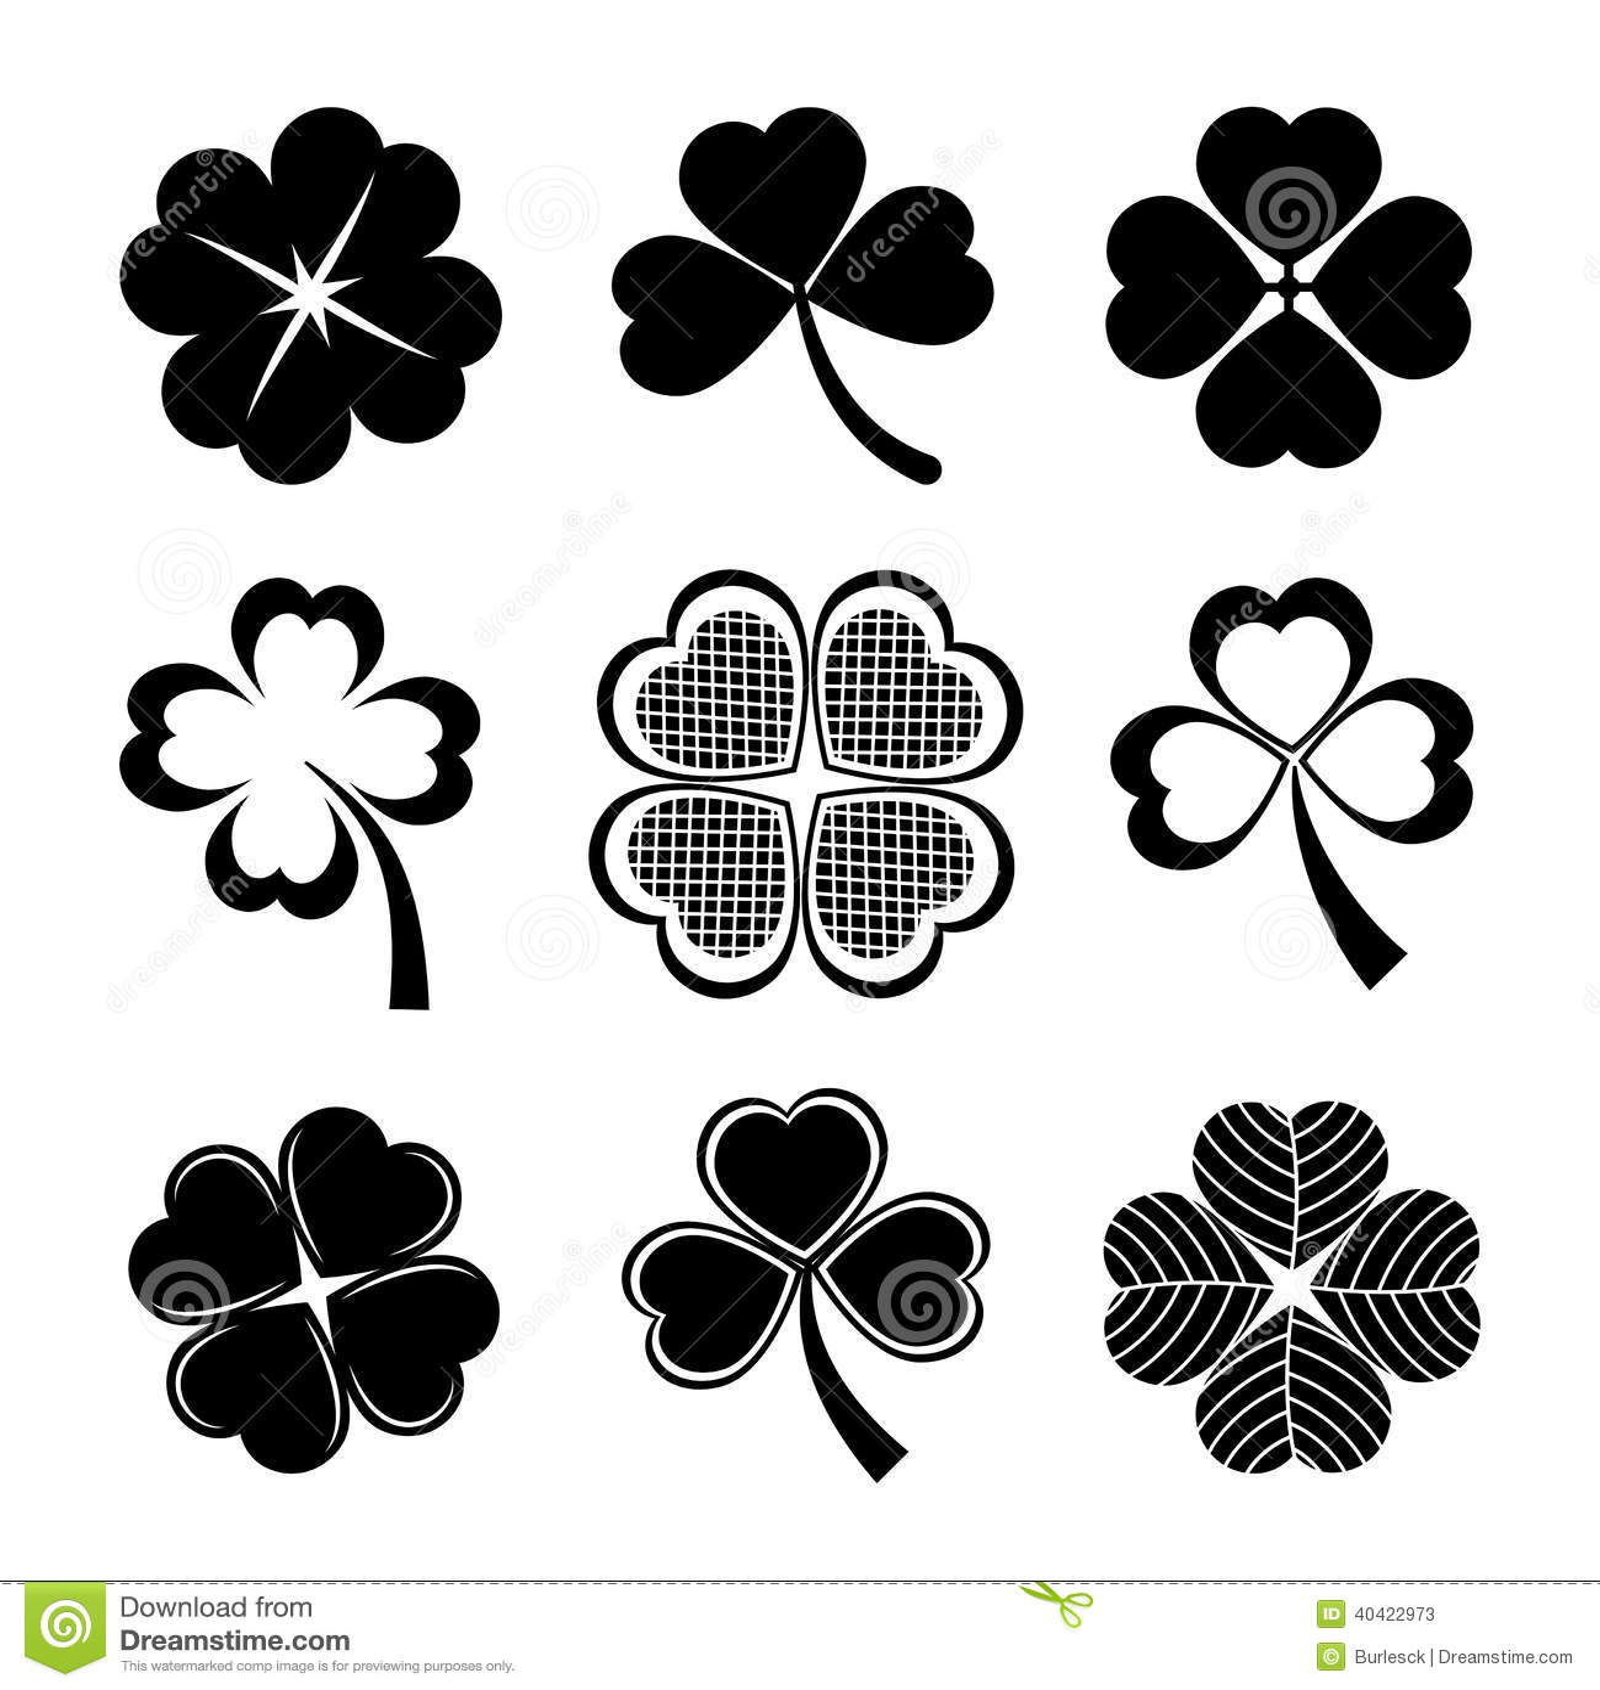 shamrock icon four leaf clover royalty free stock photo